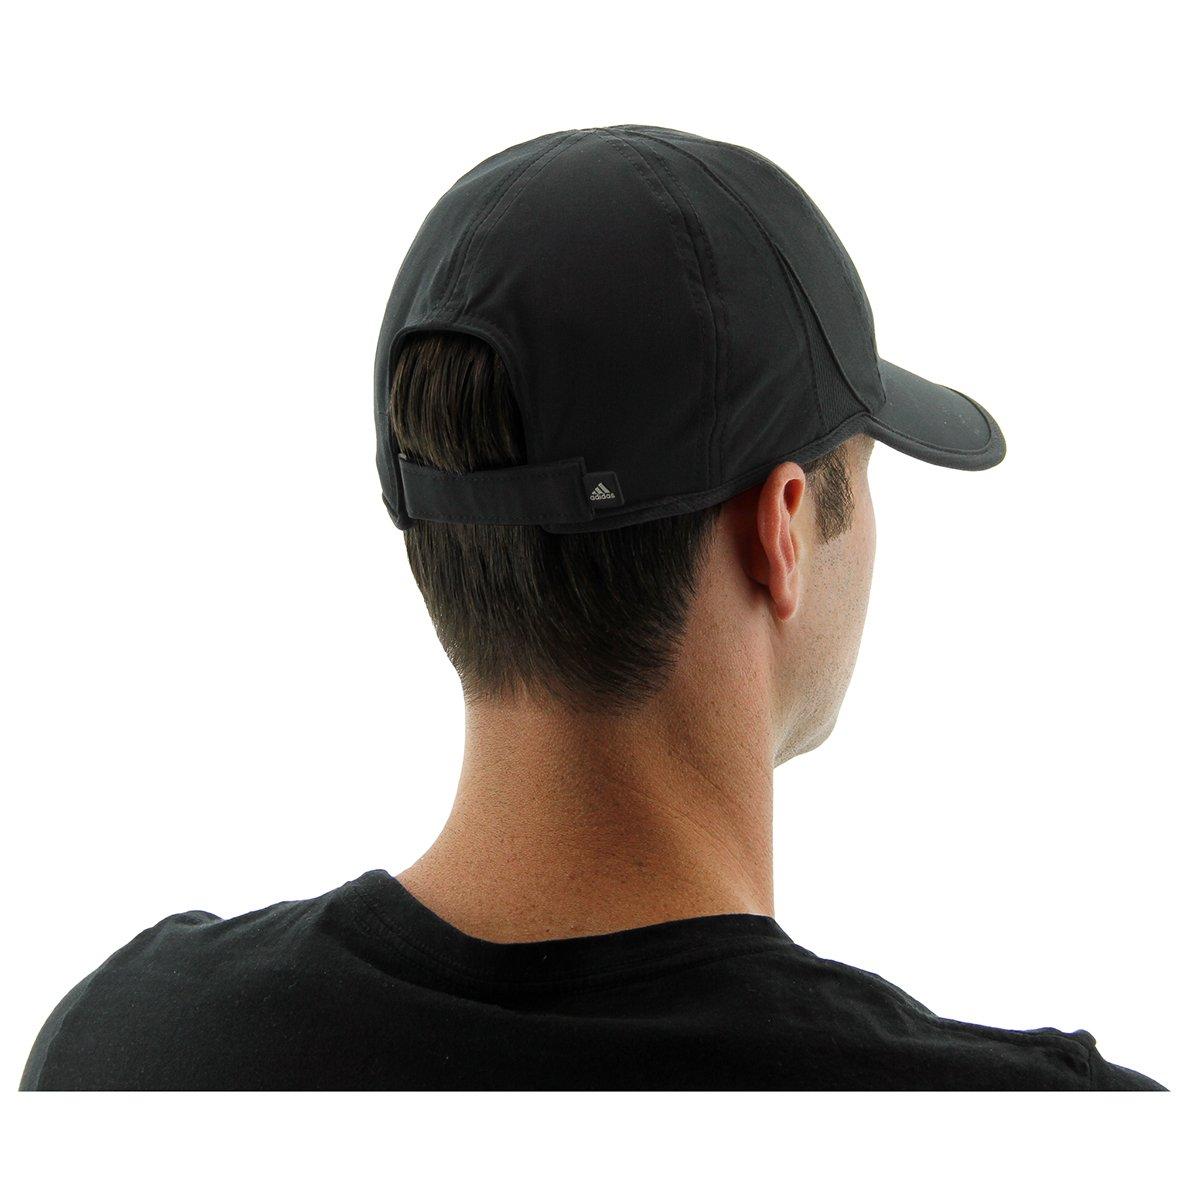 Blanc Chapeau Adidas Adizero jxb0nl